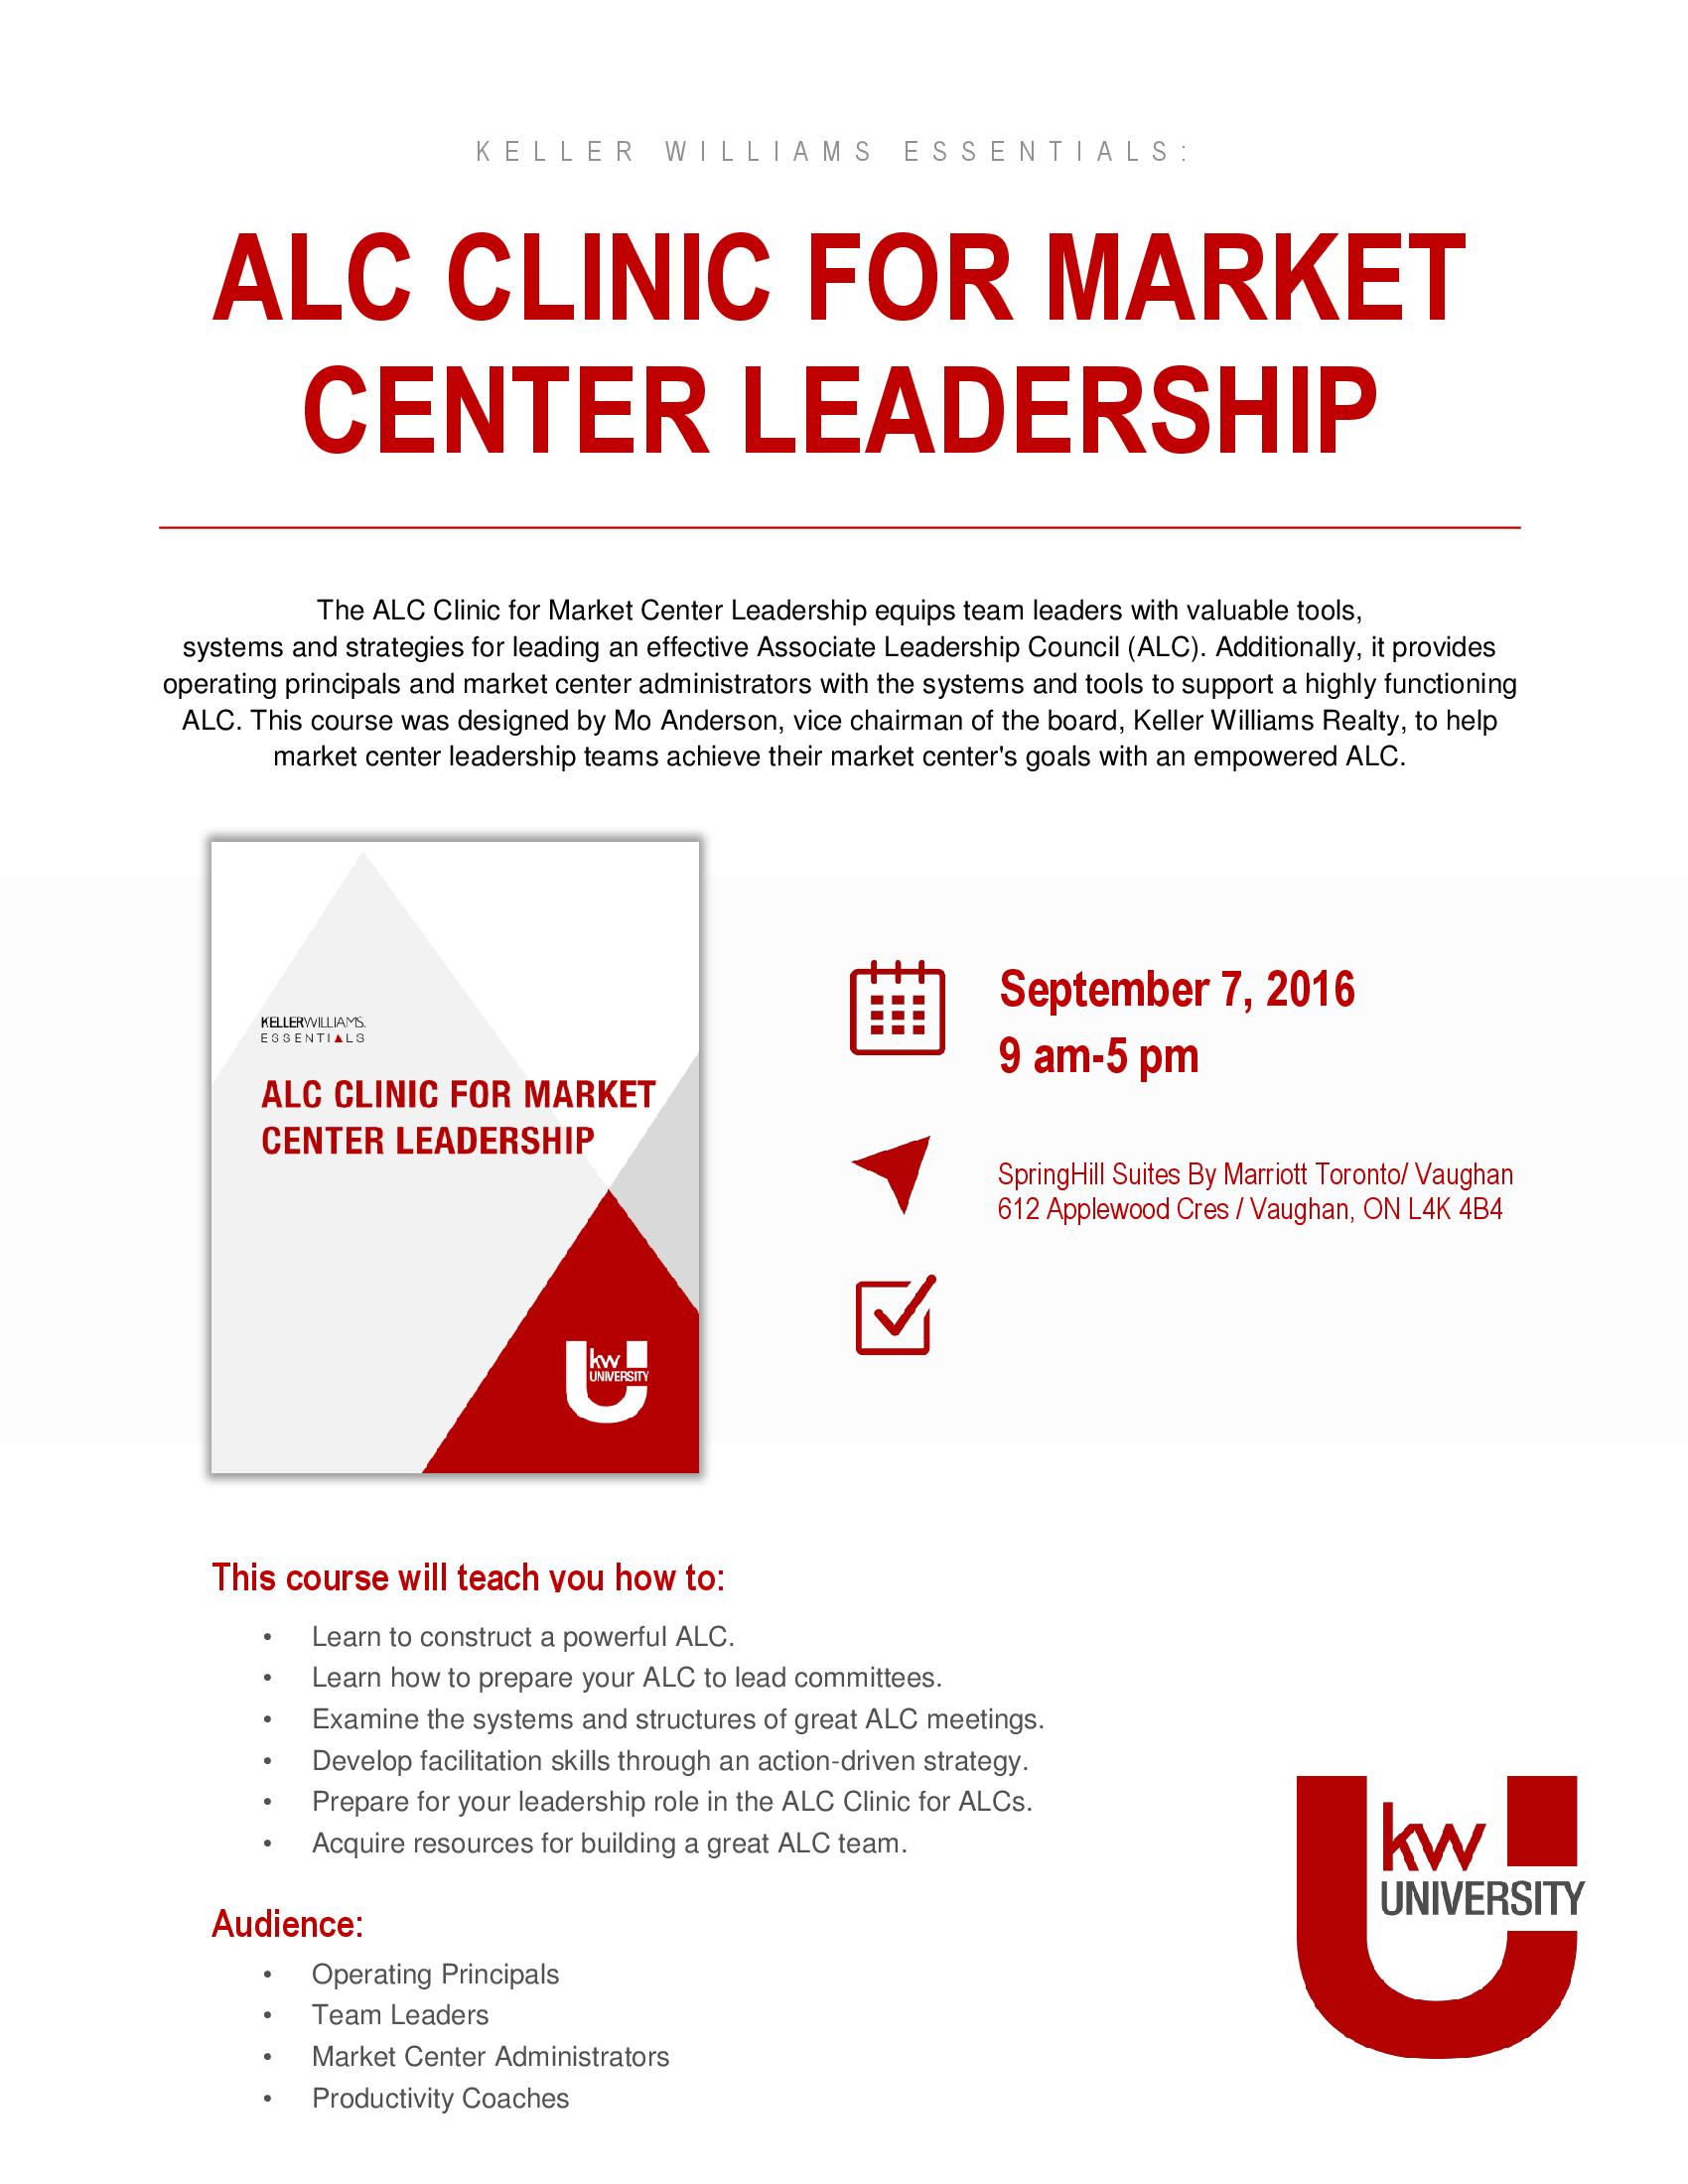 ALC Clinic Leadership